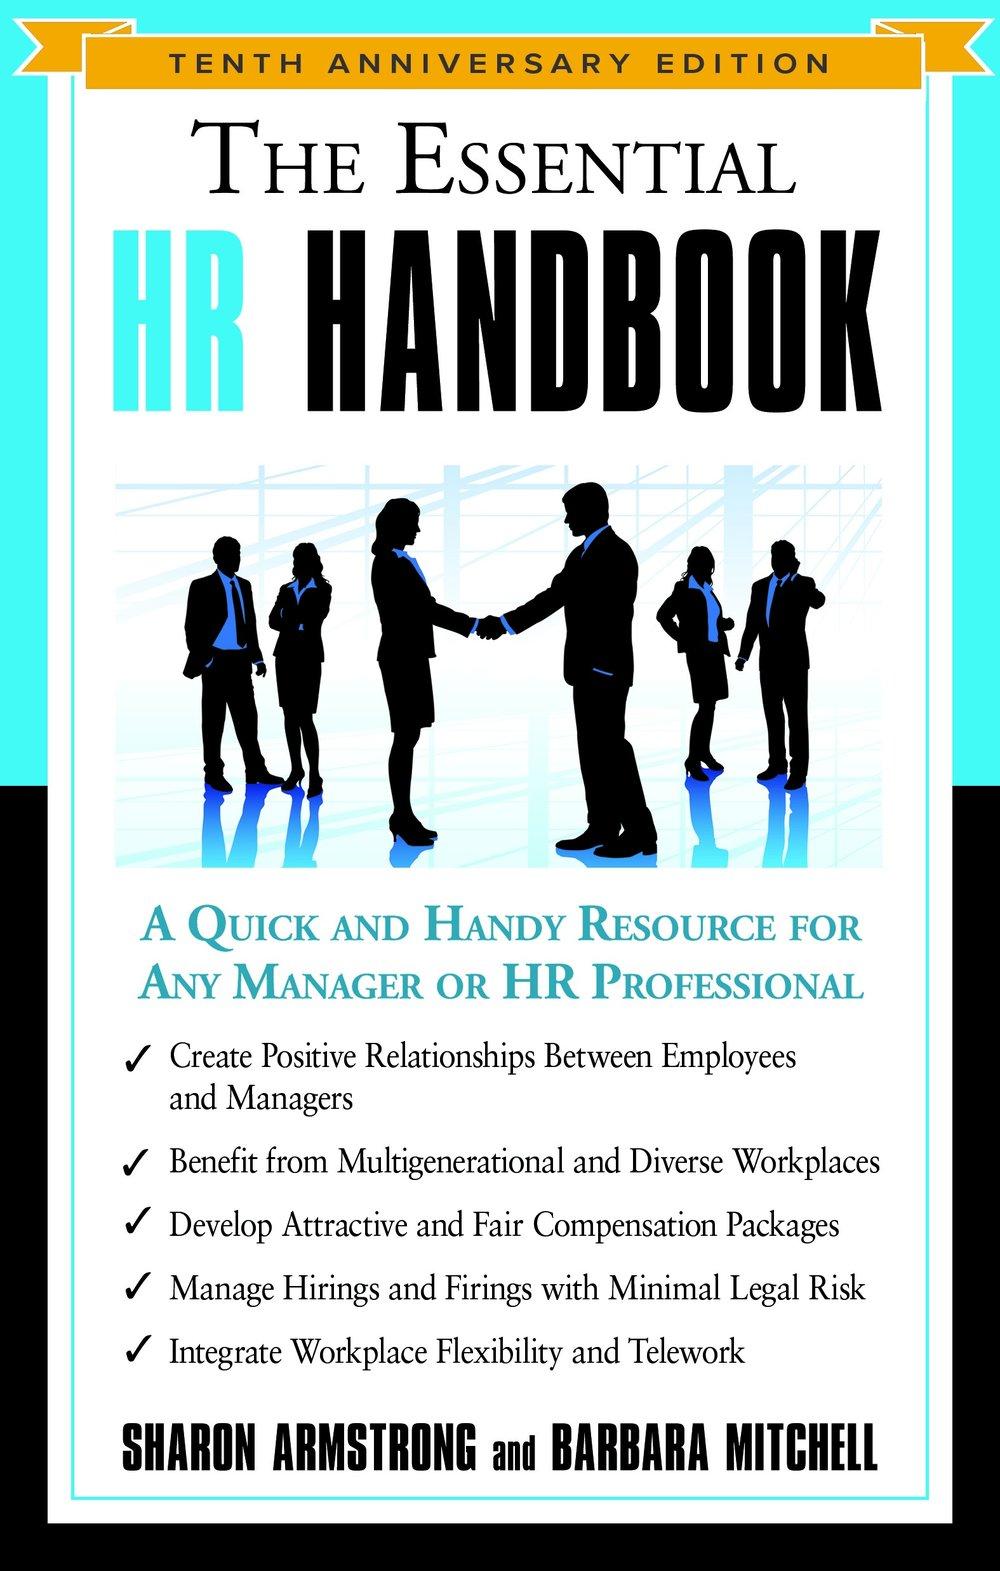 Essential+HR+Handbook+10th_9781632651396.jpg